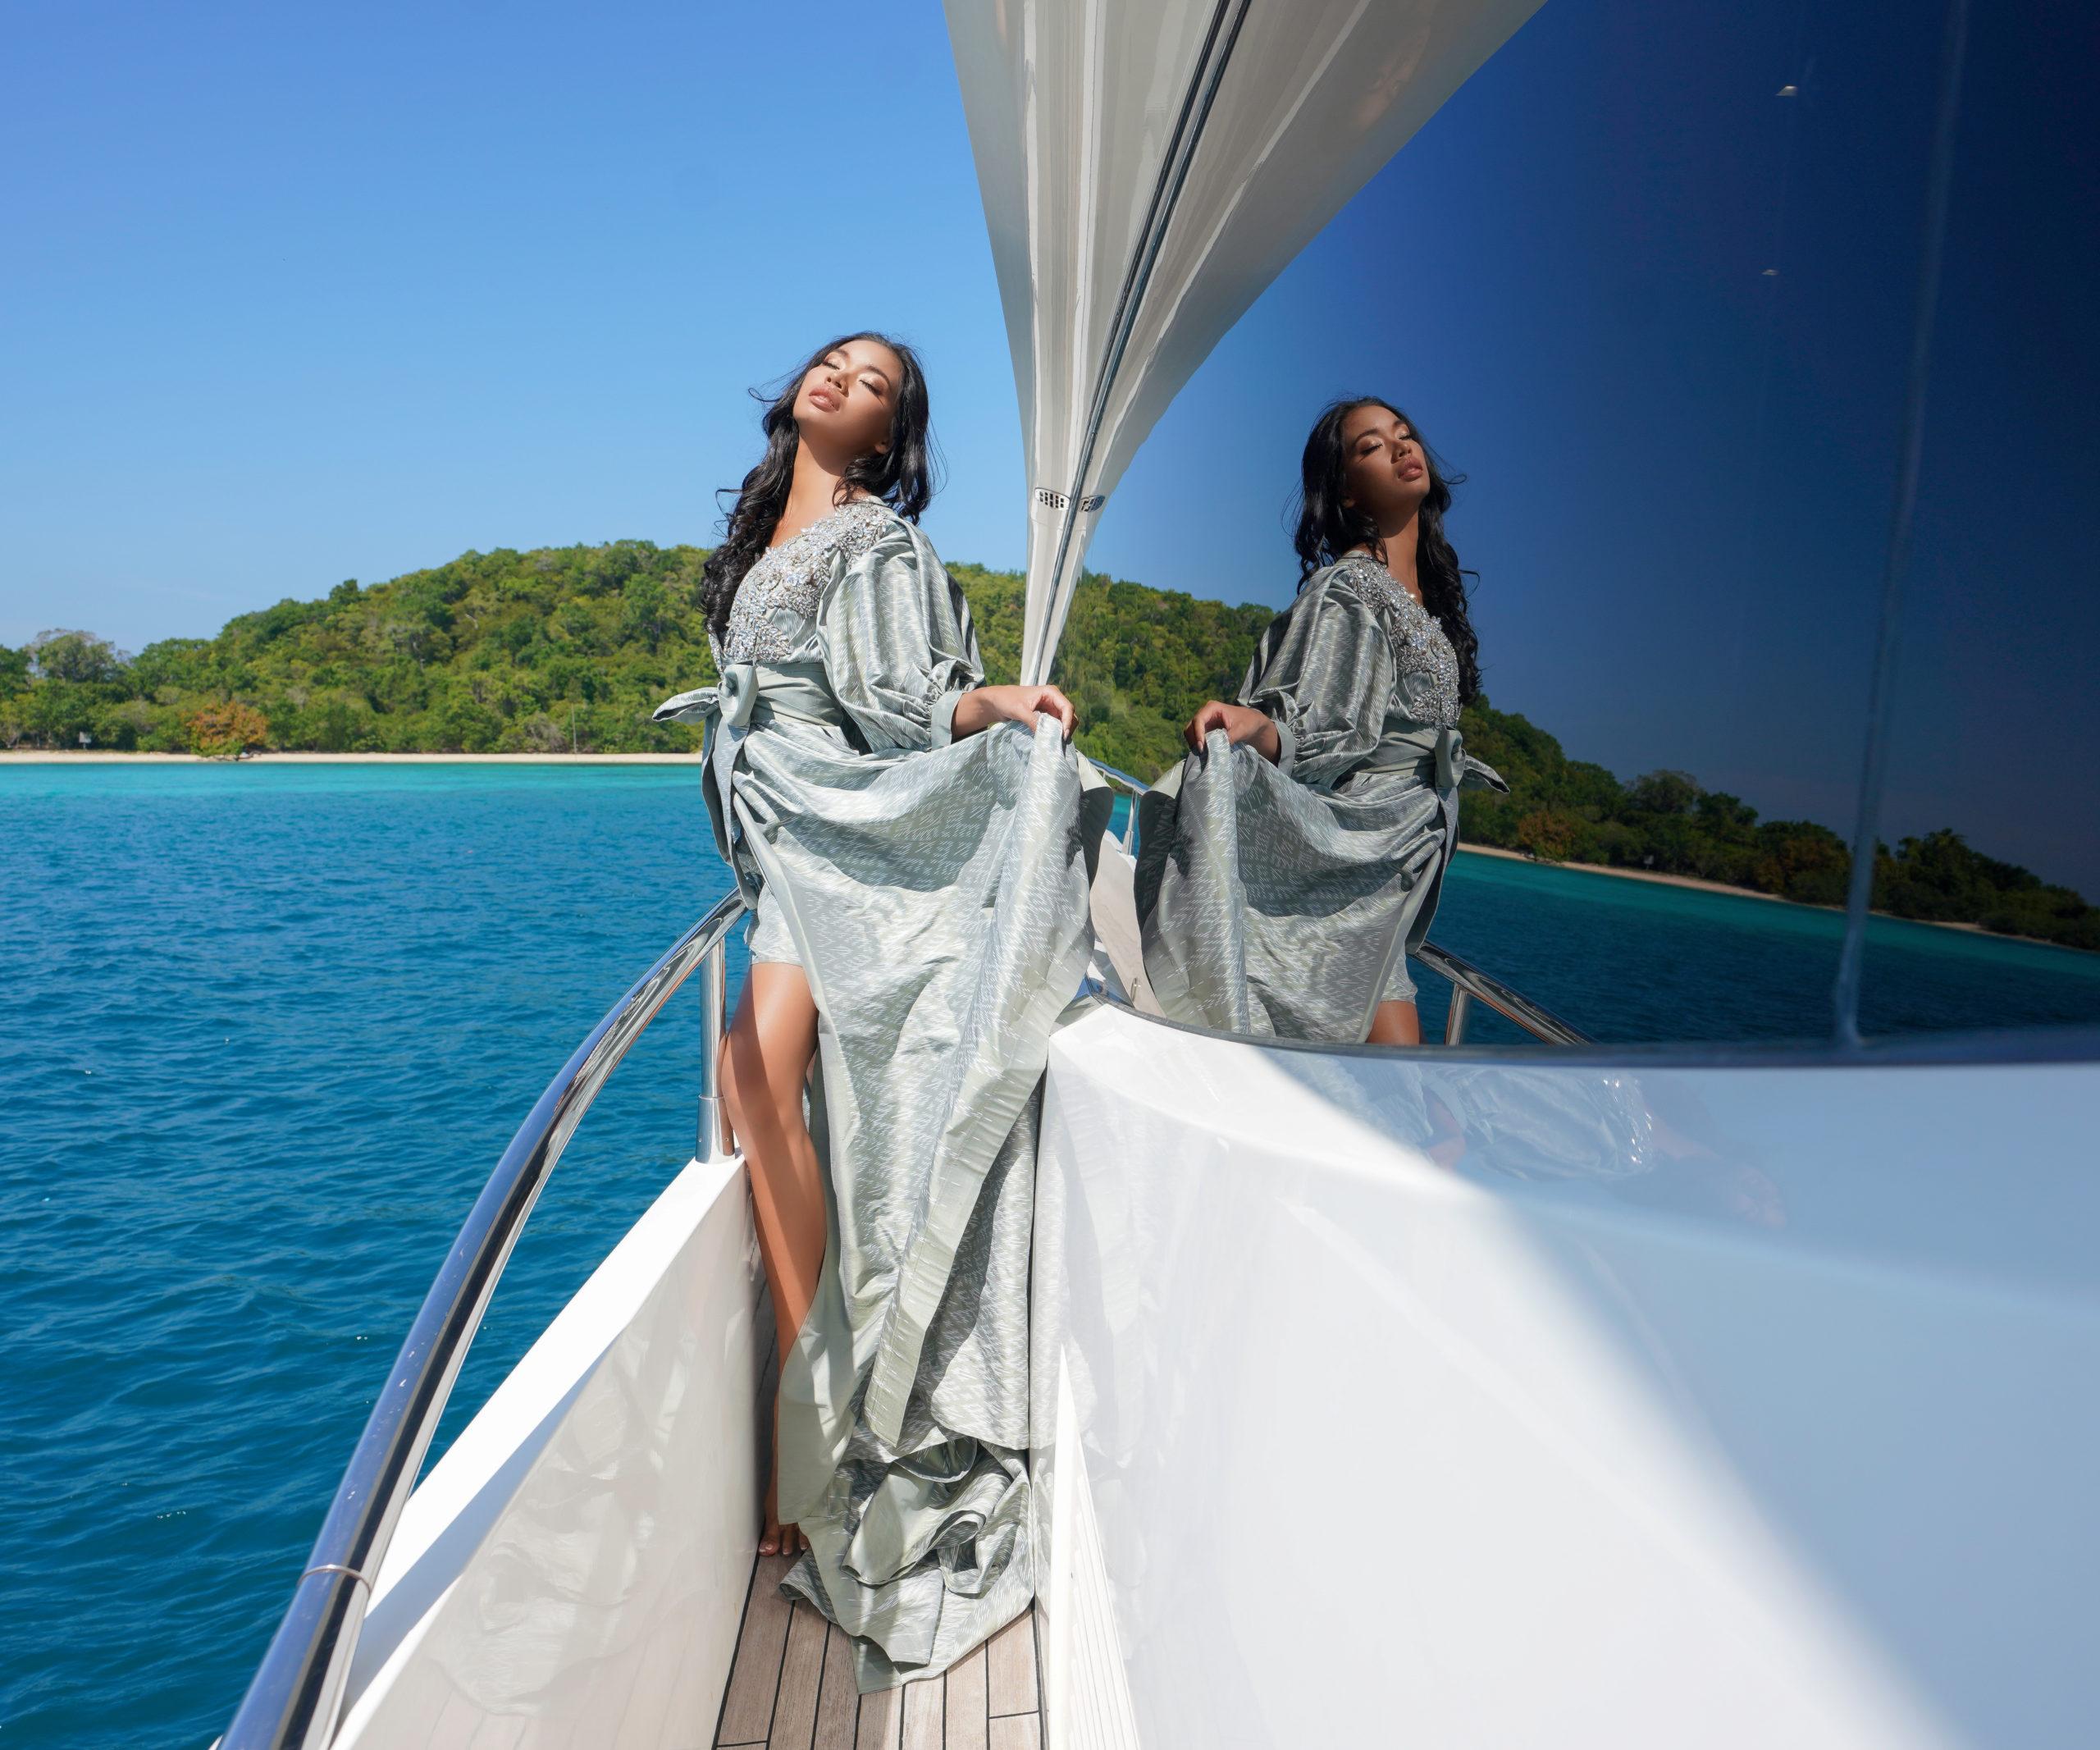 Sunseeker Manhattan 73 yacht, Ozlem Suer fashion, Gulf of Thailand, Models Borry Ra, Sunanta Yousagoon, Photography by Pimpun Jittreethieng